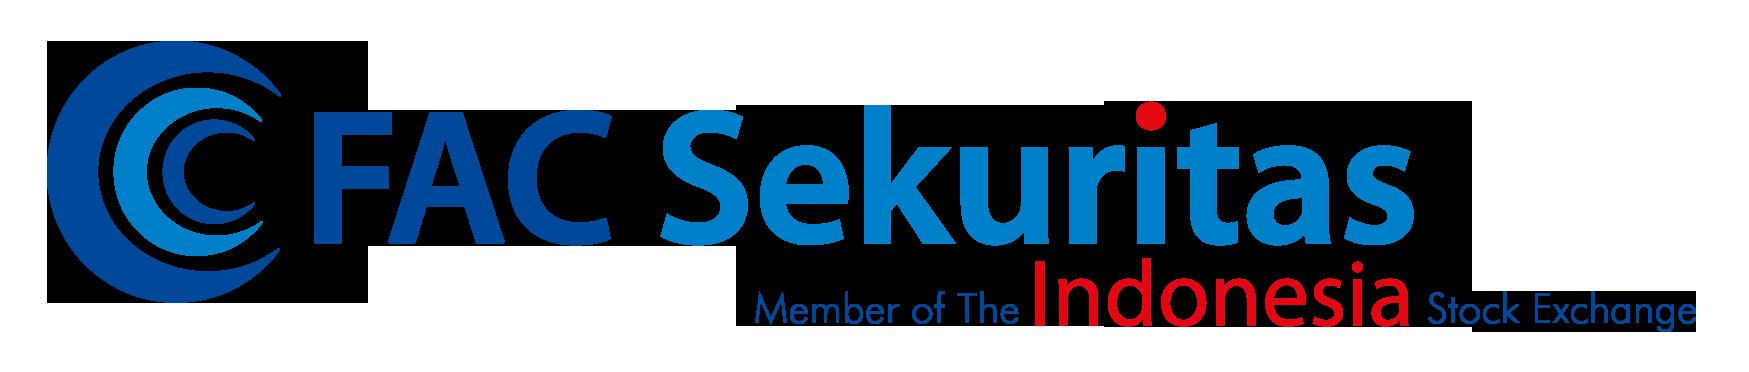 FA-Logo-FAC-Sekuritas-Indonesia-High-Res-Transparant